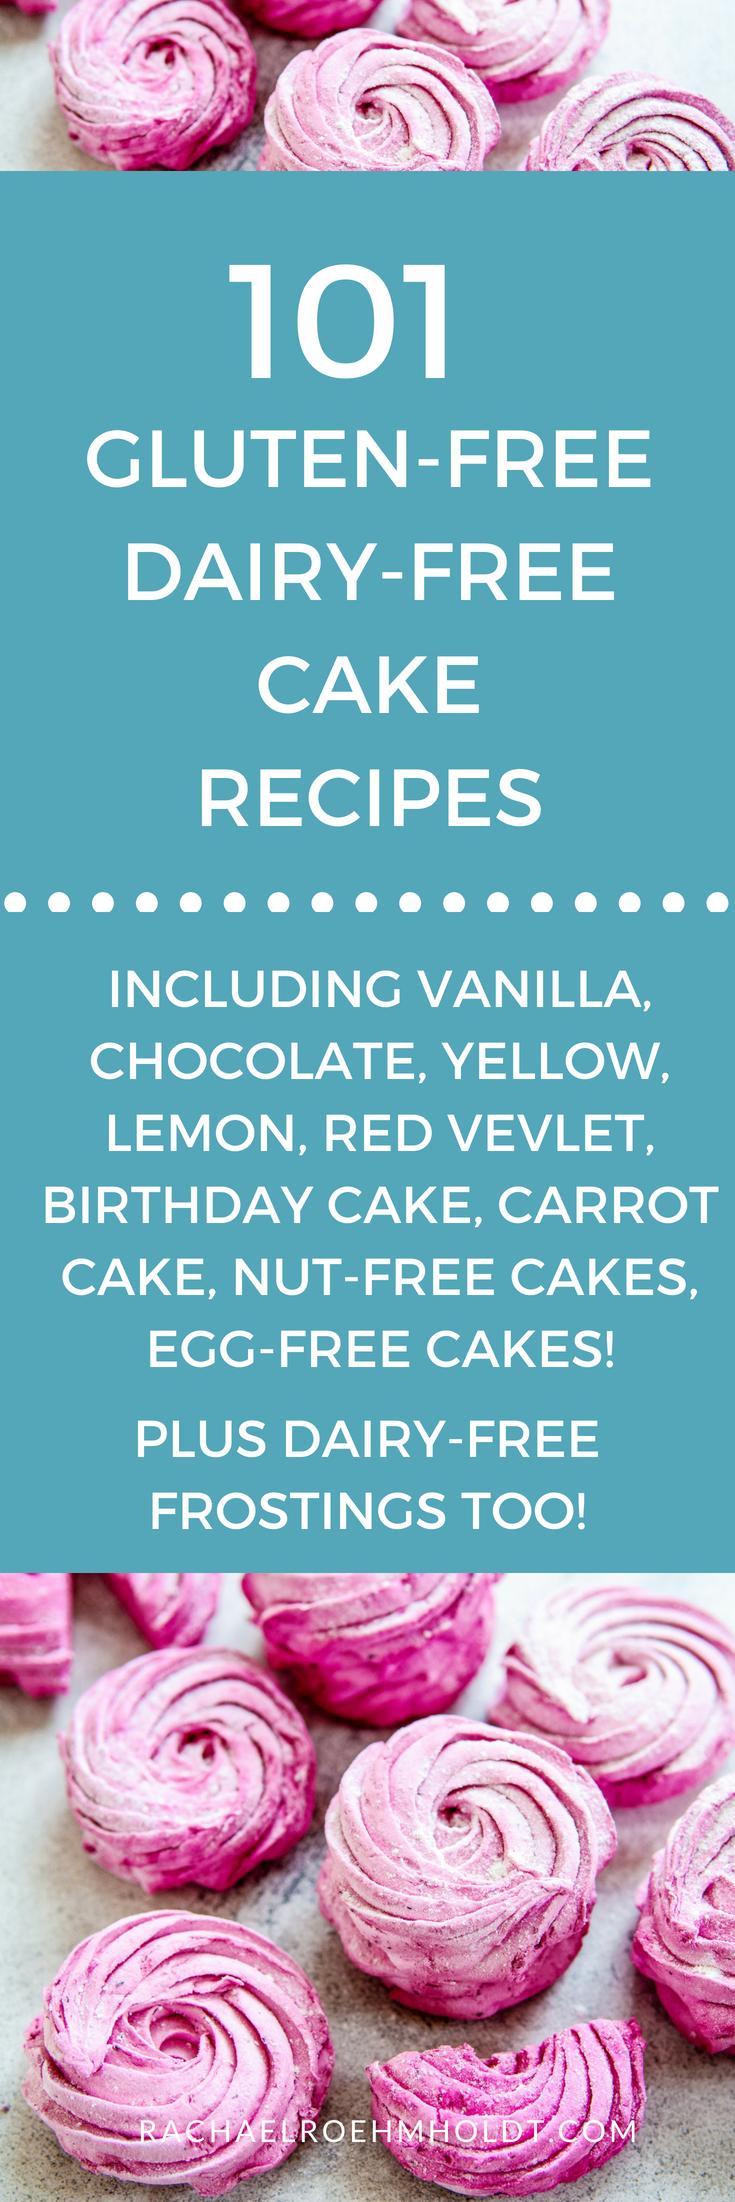 101 Gluten-free Dairy-free Cake Recipes